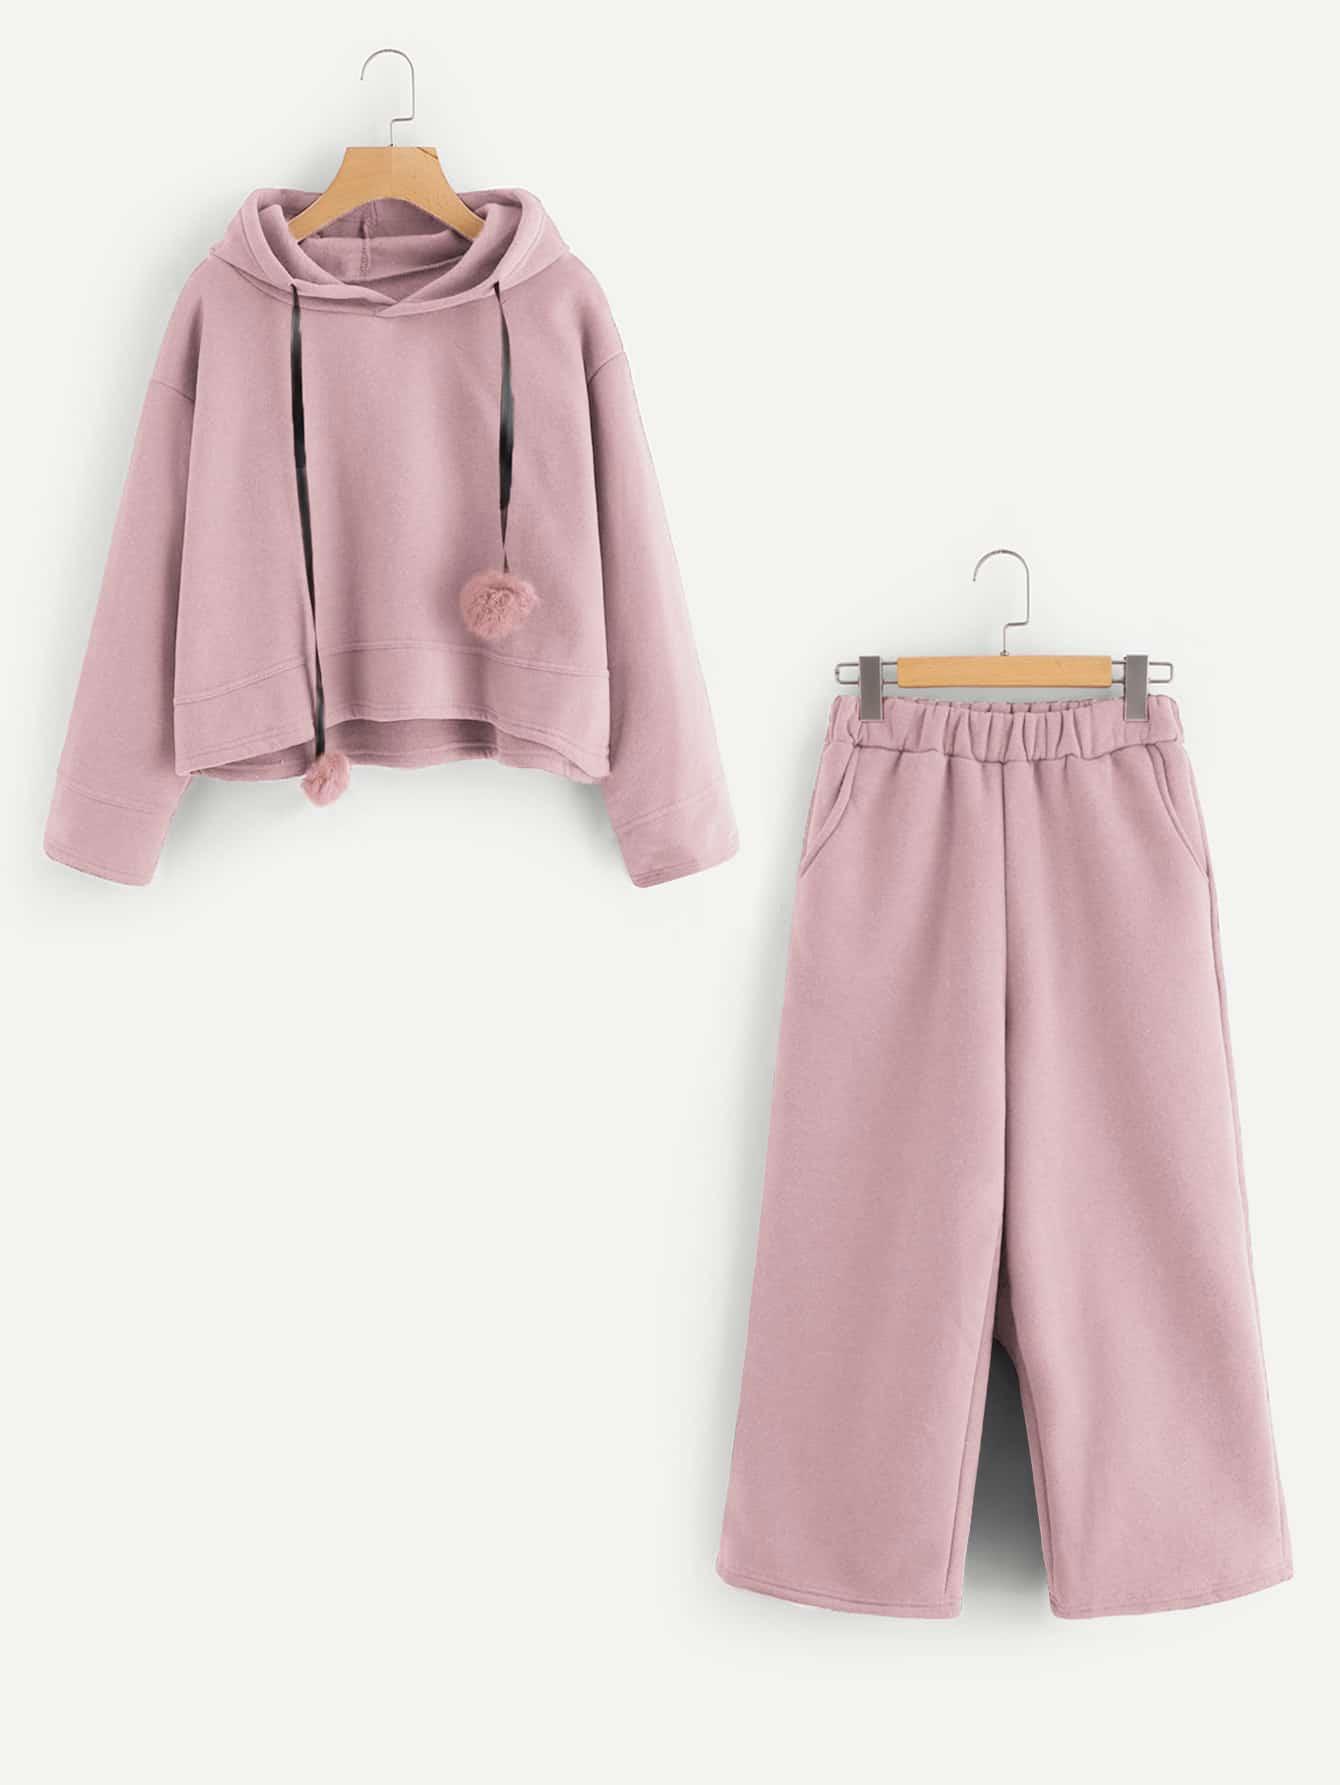 Pom Pom Detail Hoodie And Pants pom pom detail cami and shorts set